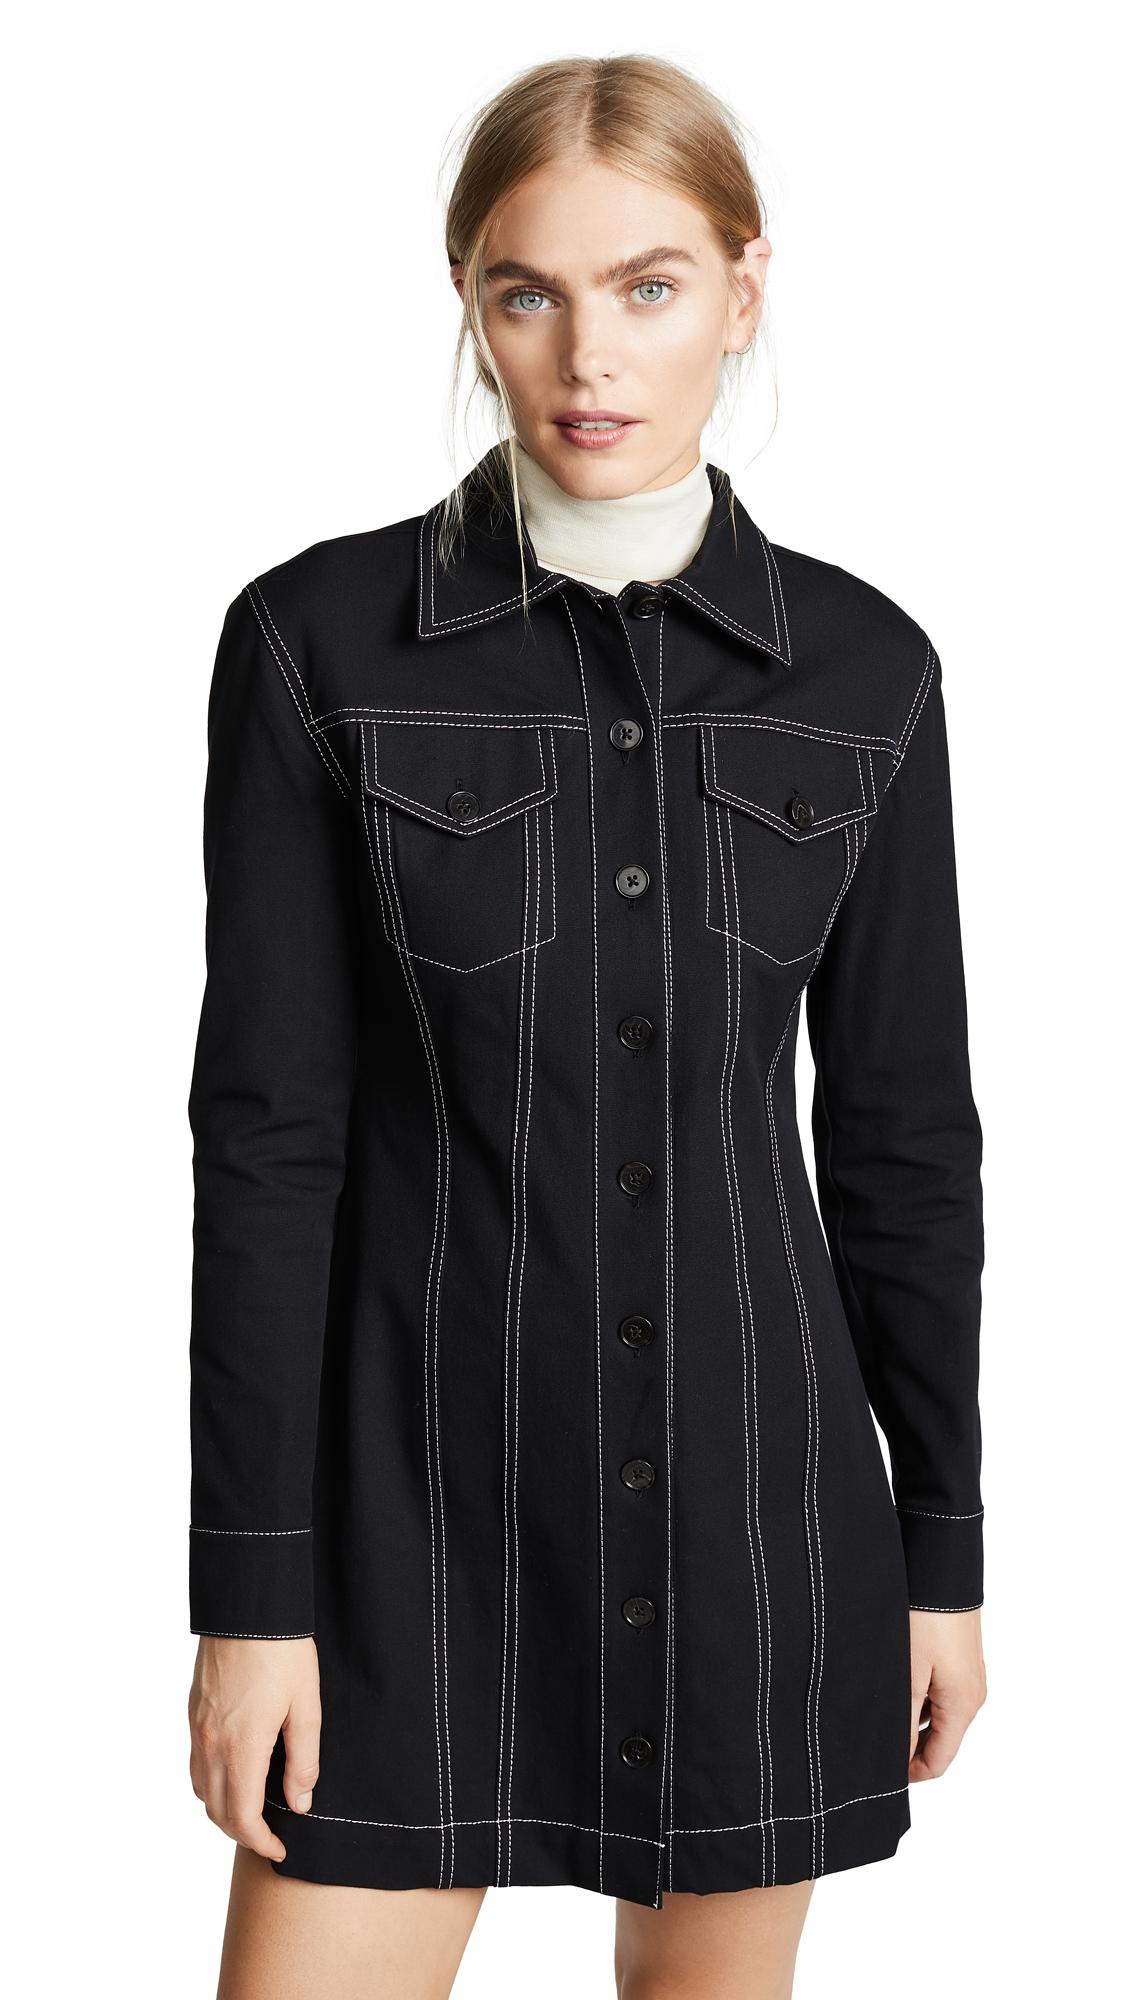 Derek Lam 10 Crosby Button-Down Dress With Top Stitching In Black